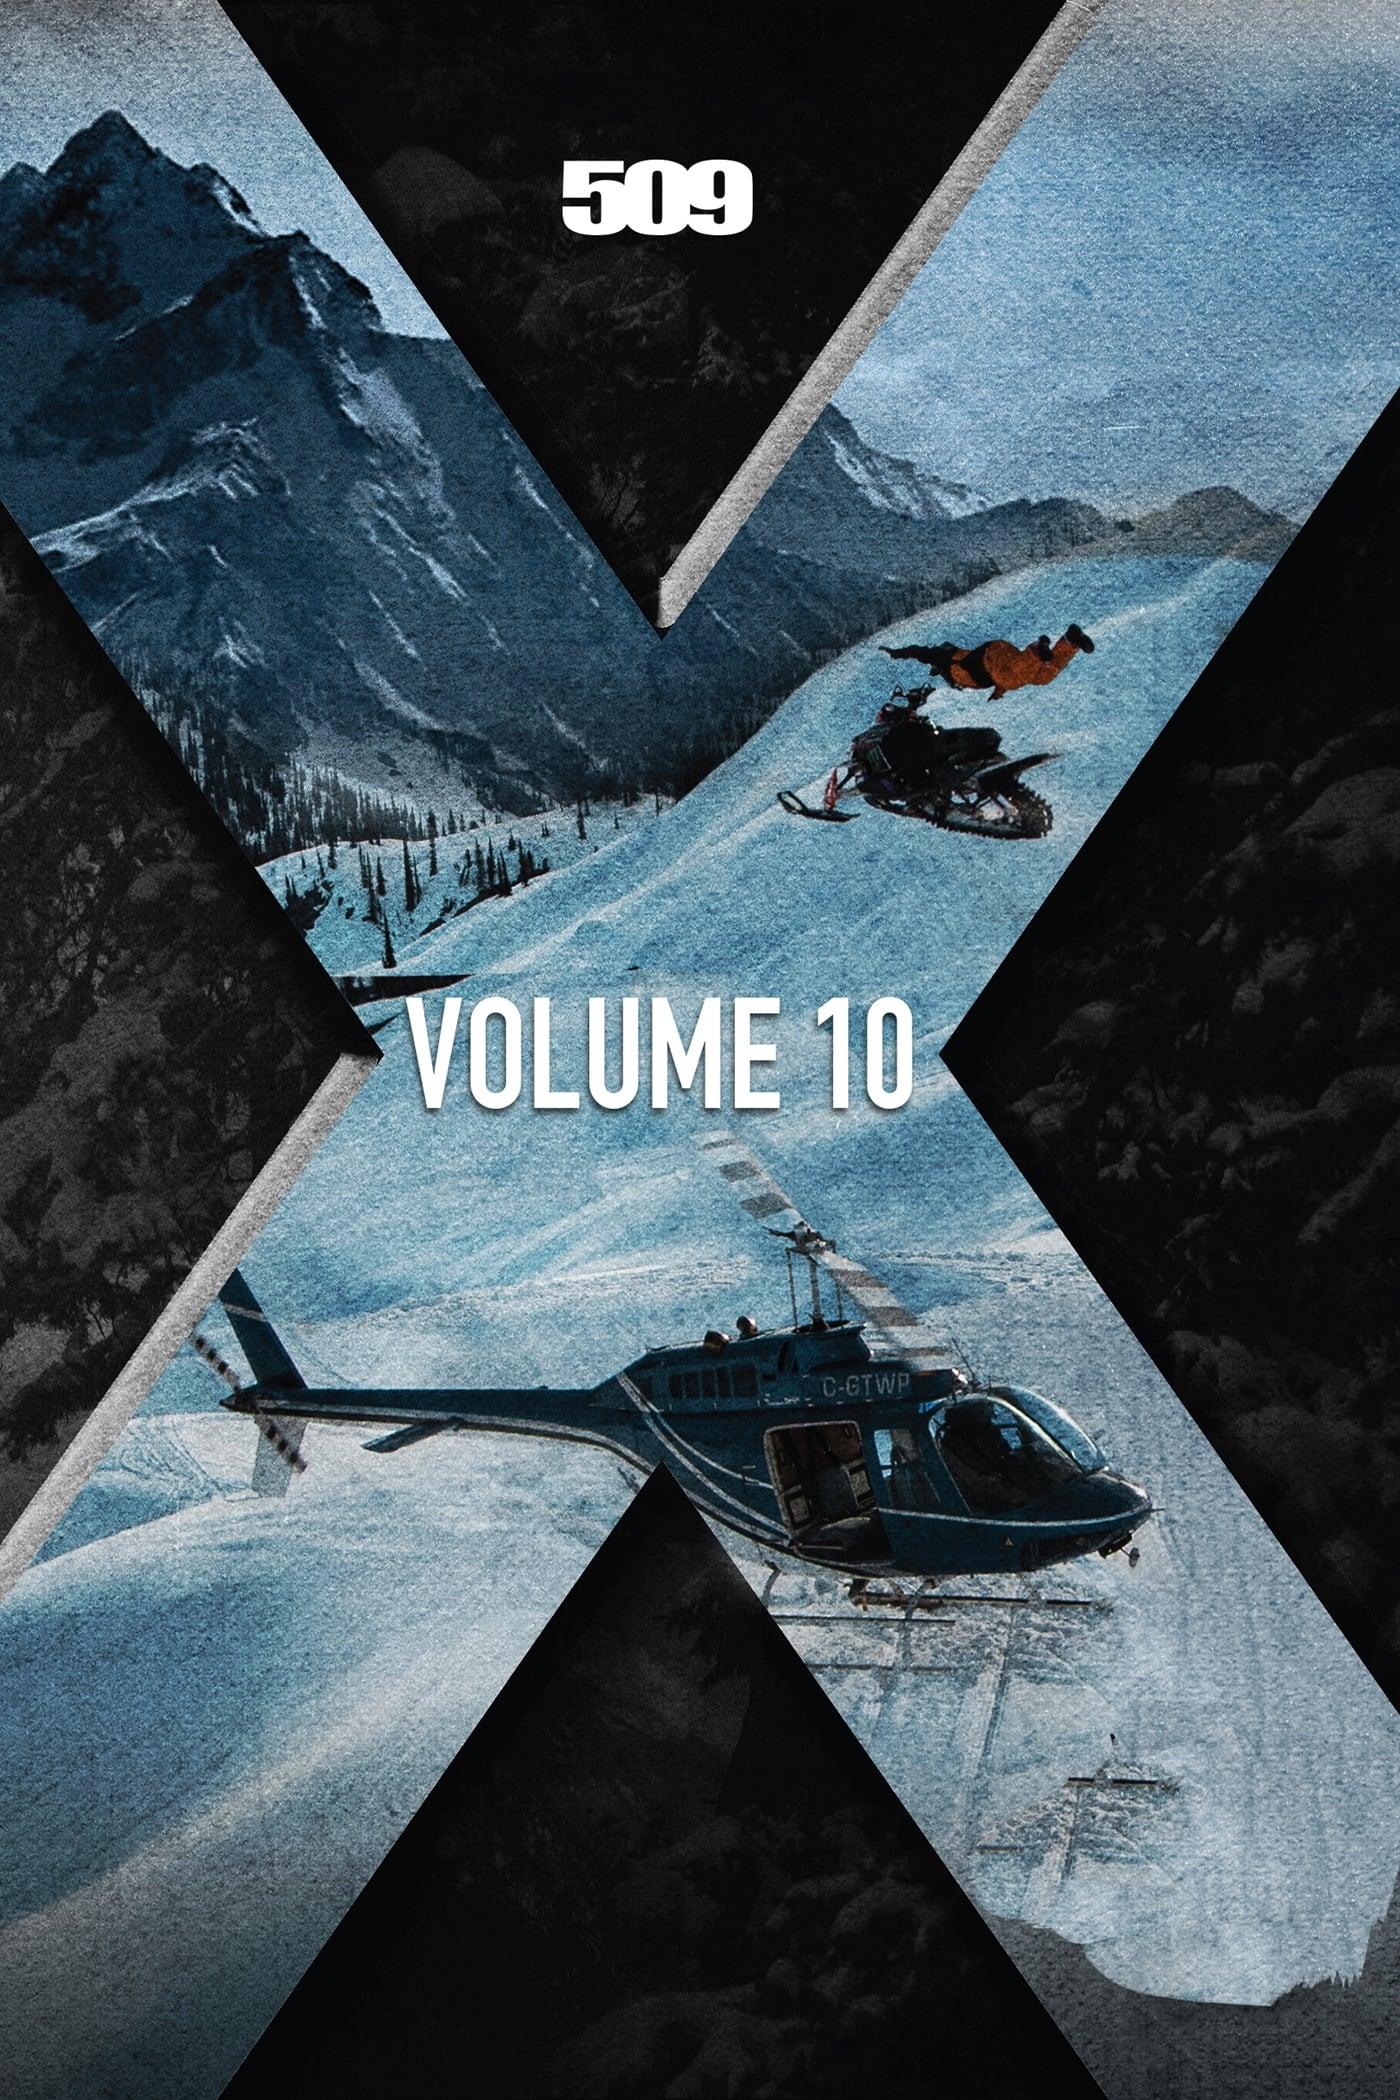 509 Films: Volume 10